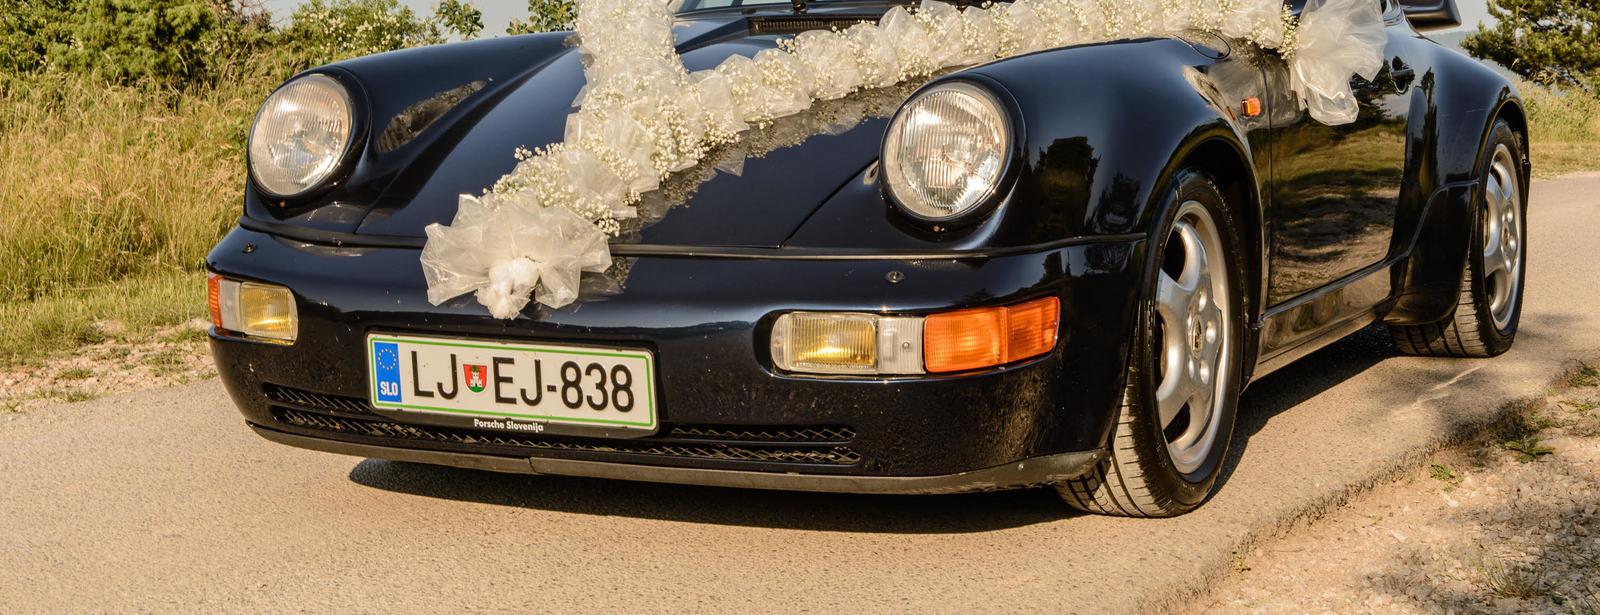 964 Turbo Avtomobili Clanov Porsche Klub Slovenija